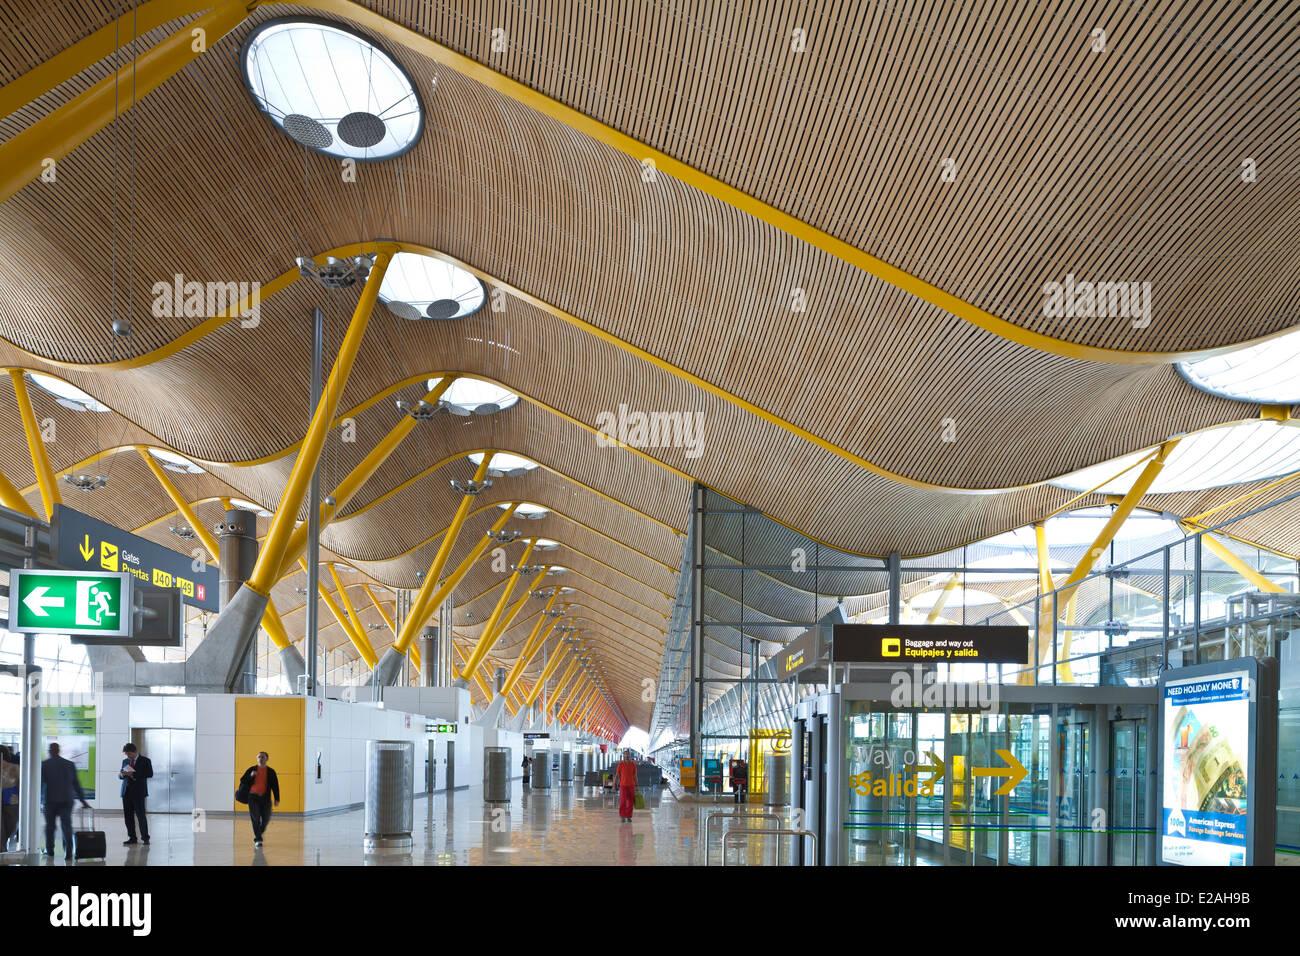 Madrid International Airport: photos and descriptions, terminals, flights and passenger reviews 62